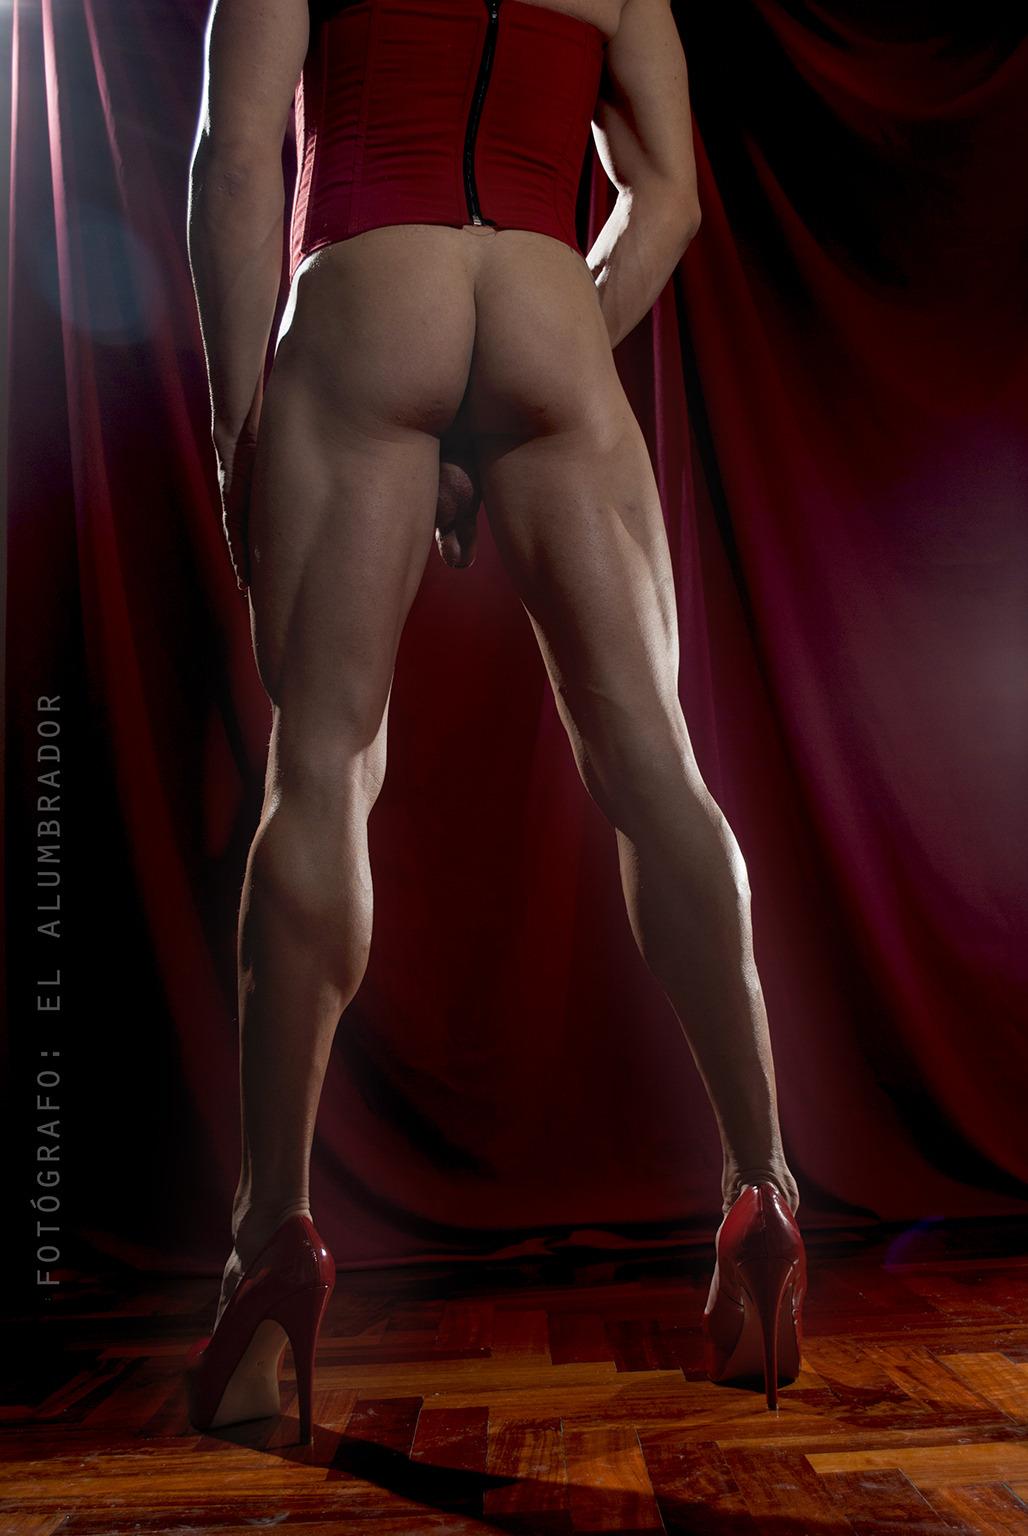 Muscular crossdressers big cocks Hung Crossdresser Tumblr